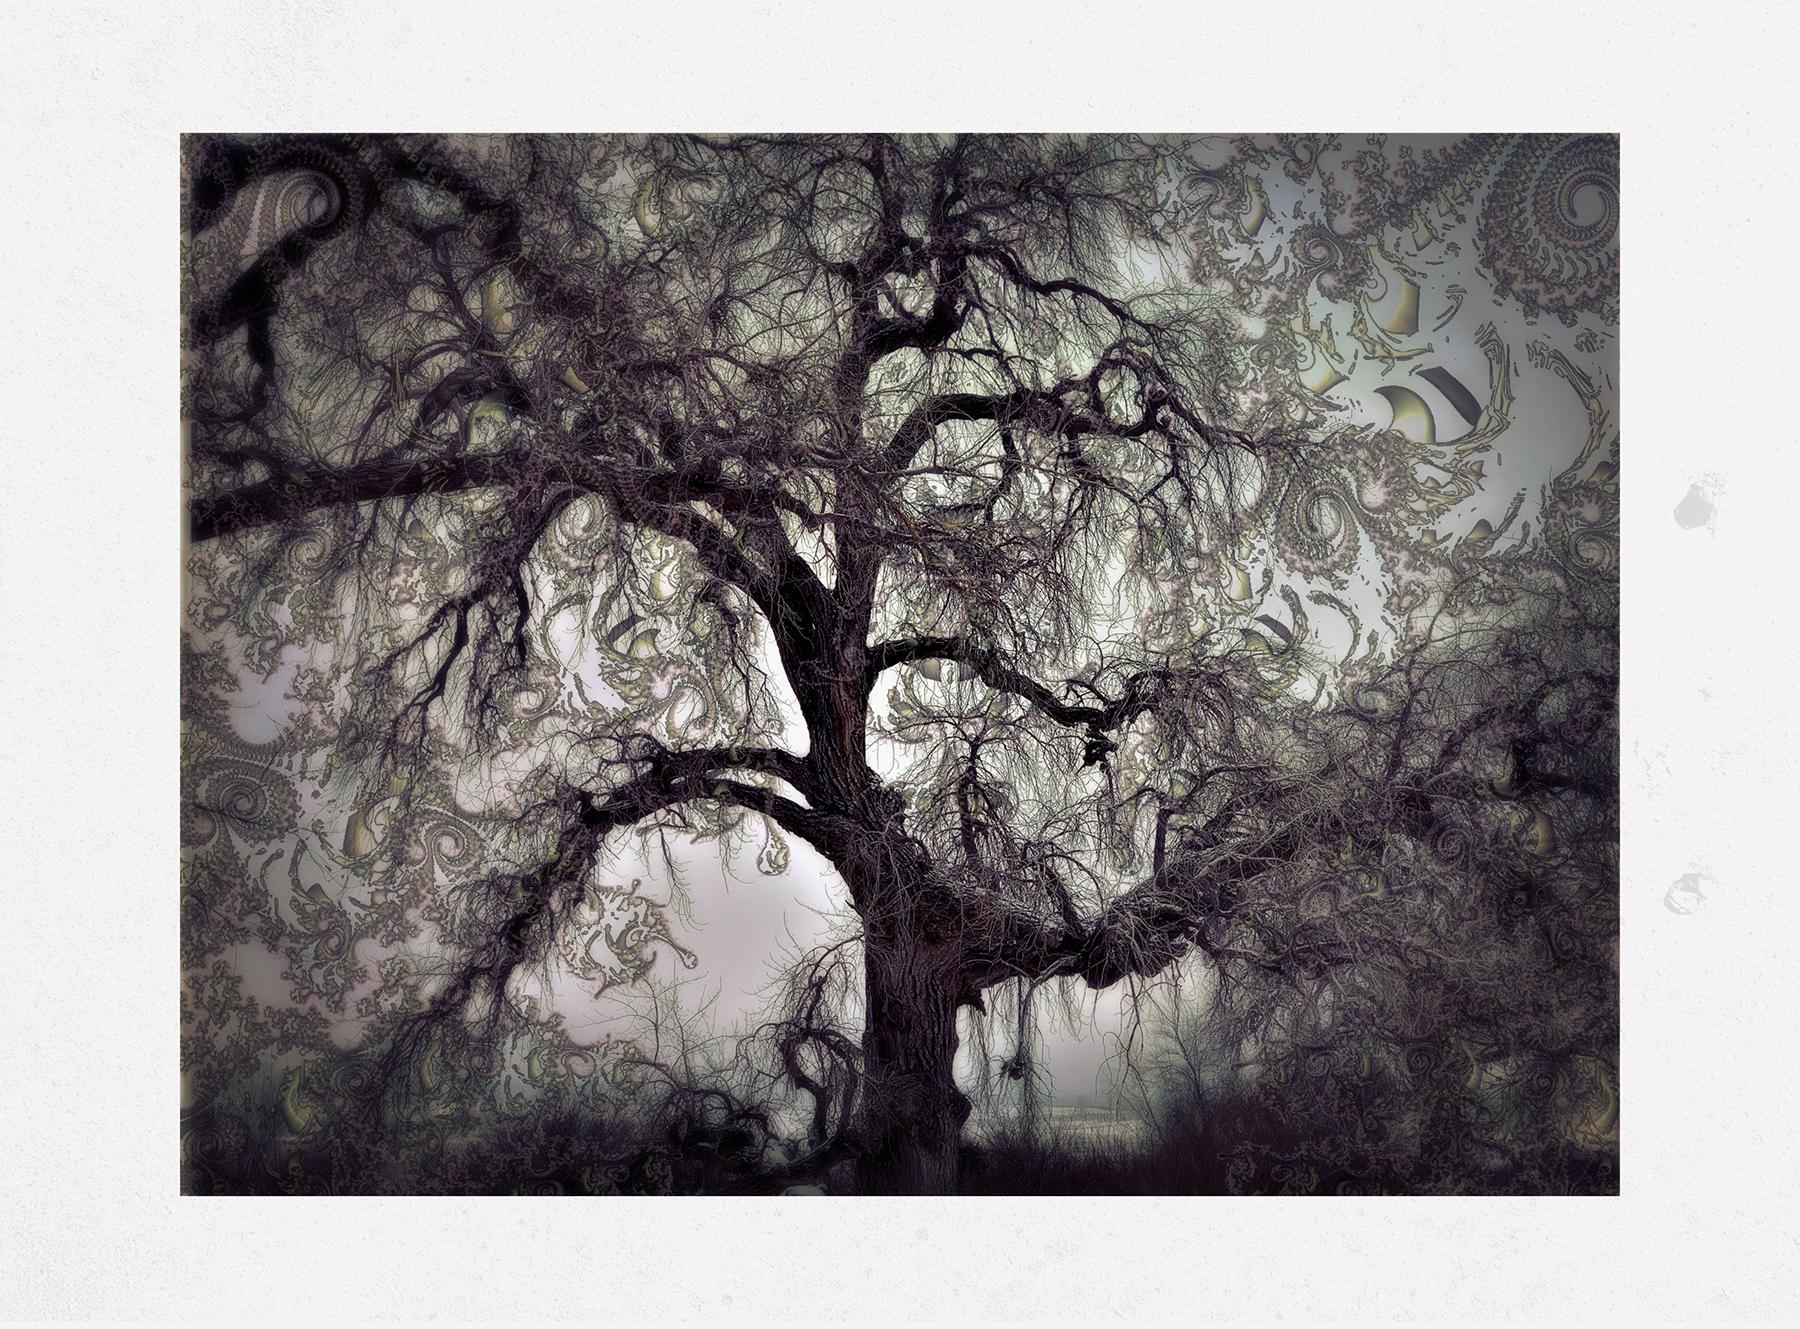 Kate_ZariRoberts_Nature Fractals_ Tree Fractal ll_2.jpg